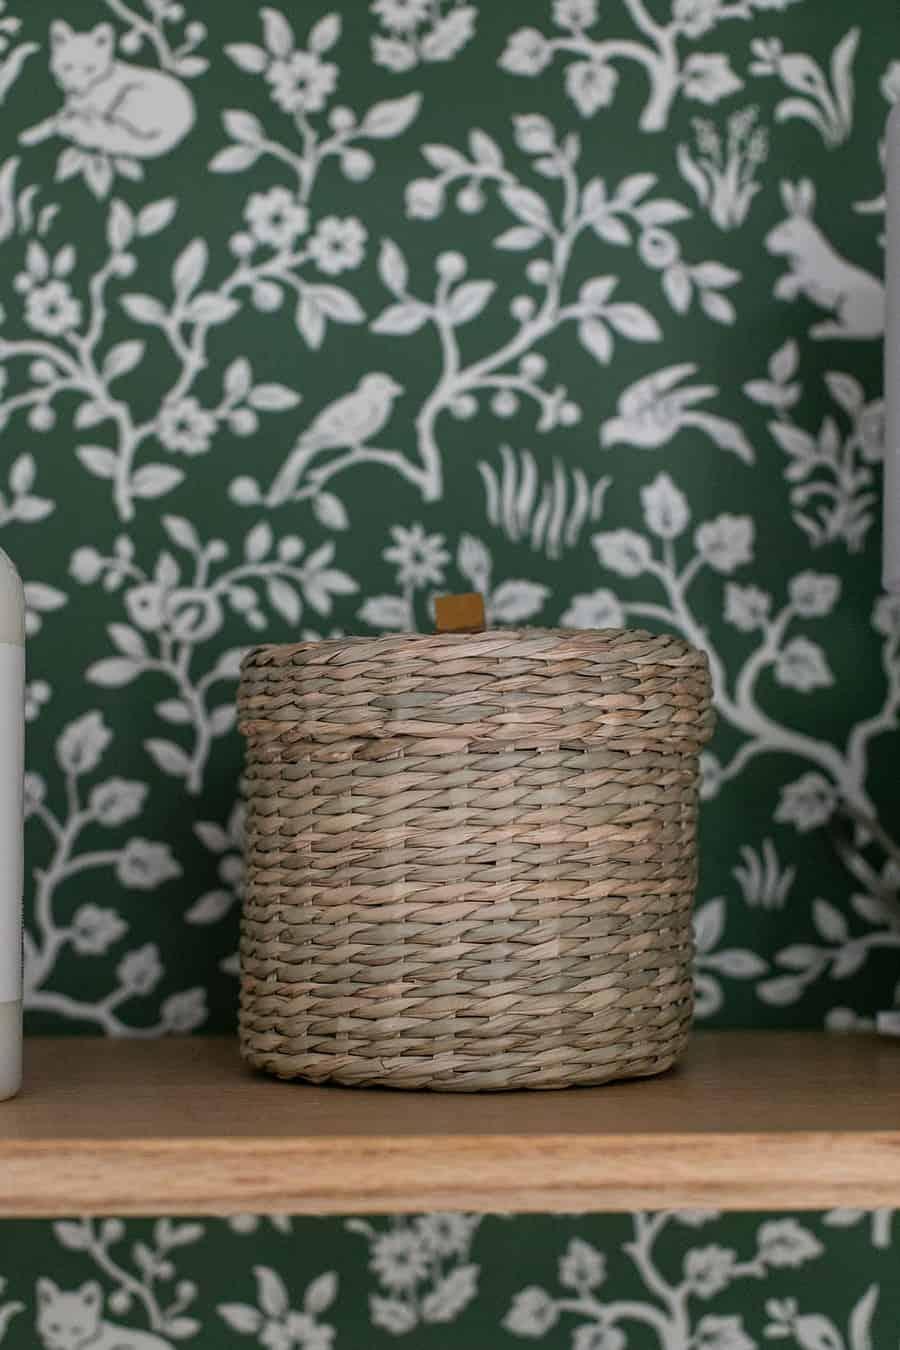 Woven basket on an oak shelf with green wallpaper.